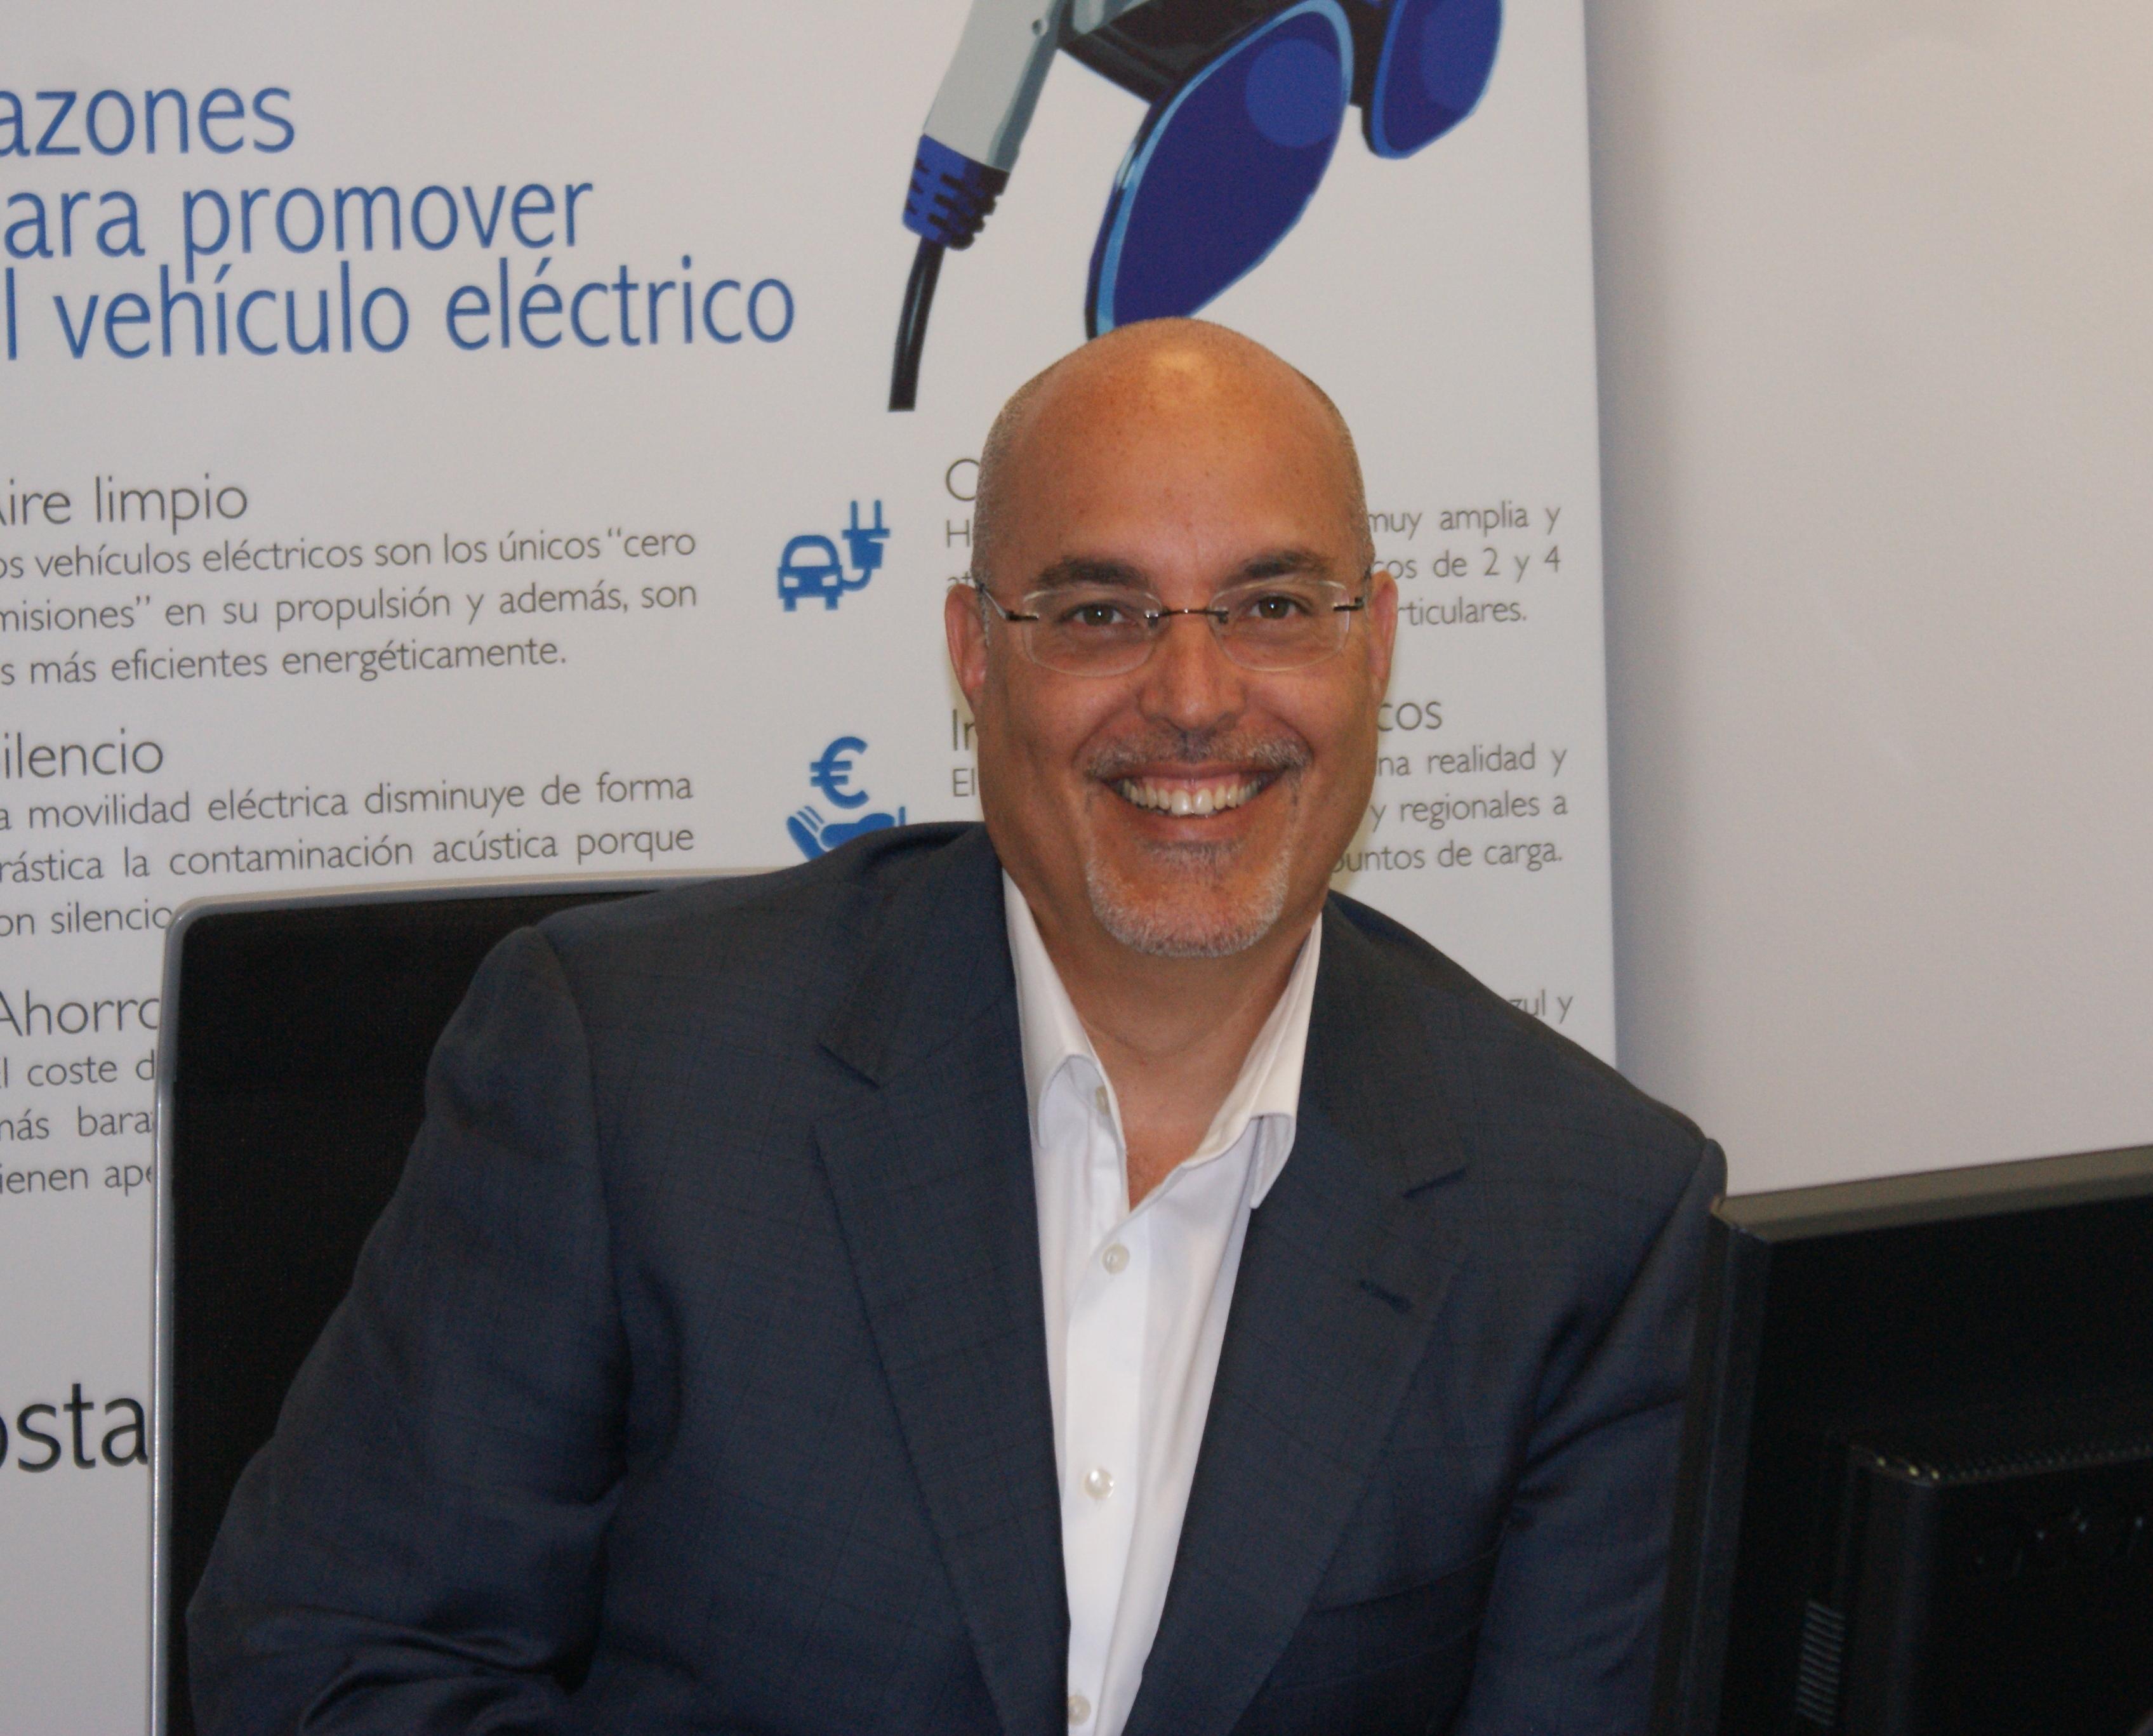 Arturo Pérez de Lucia